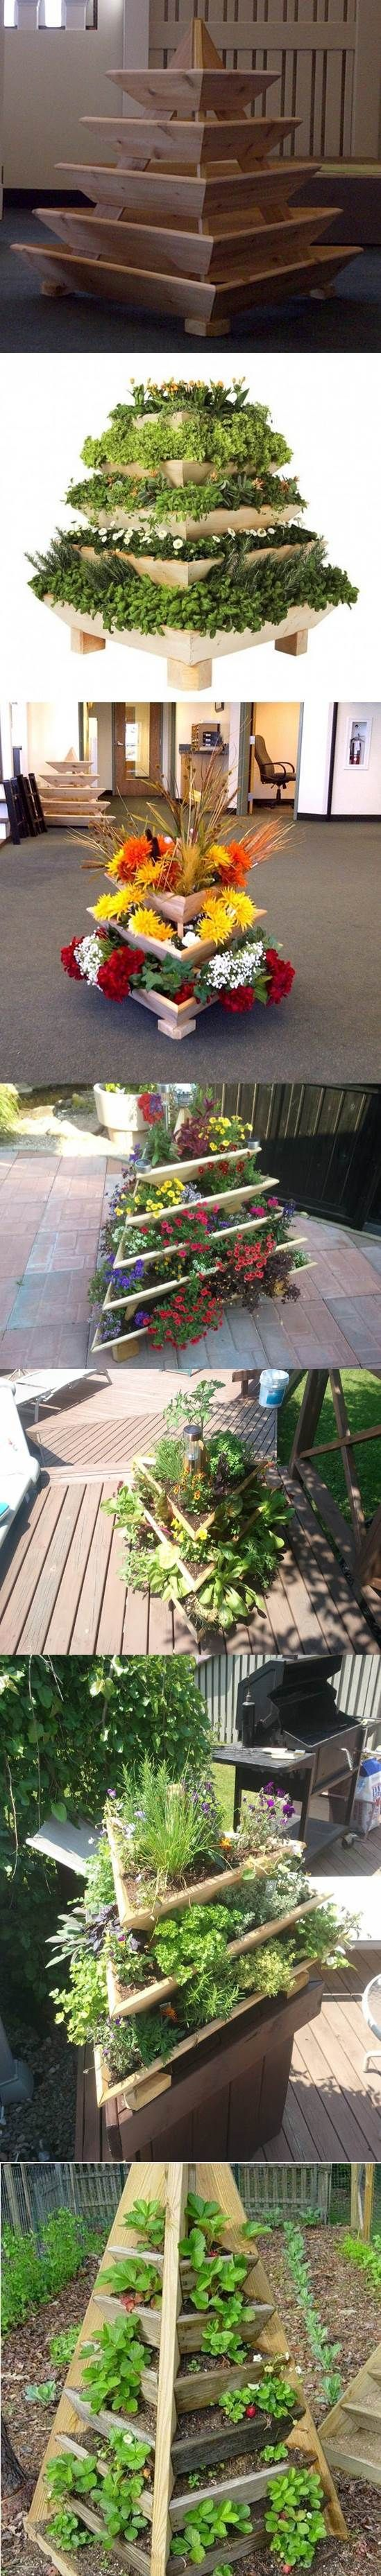 Creative Idea of Home Gardening - Triolife Plant Pyramid.